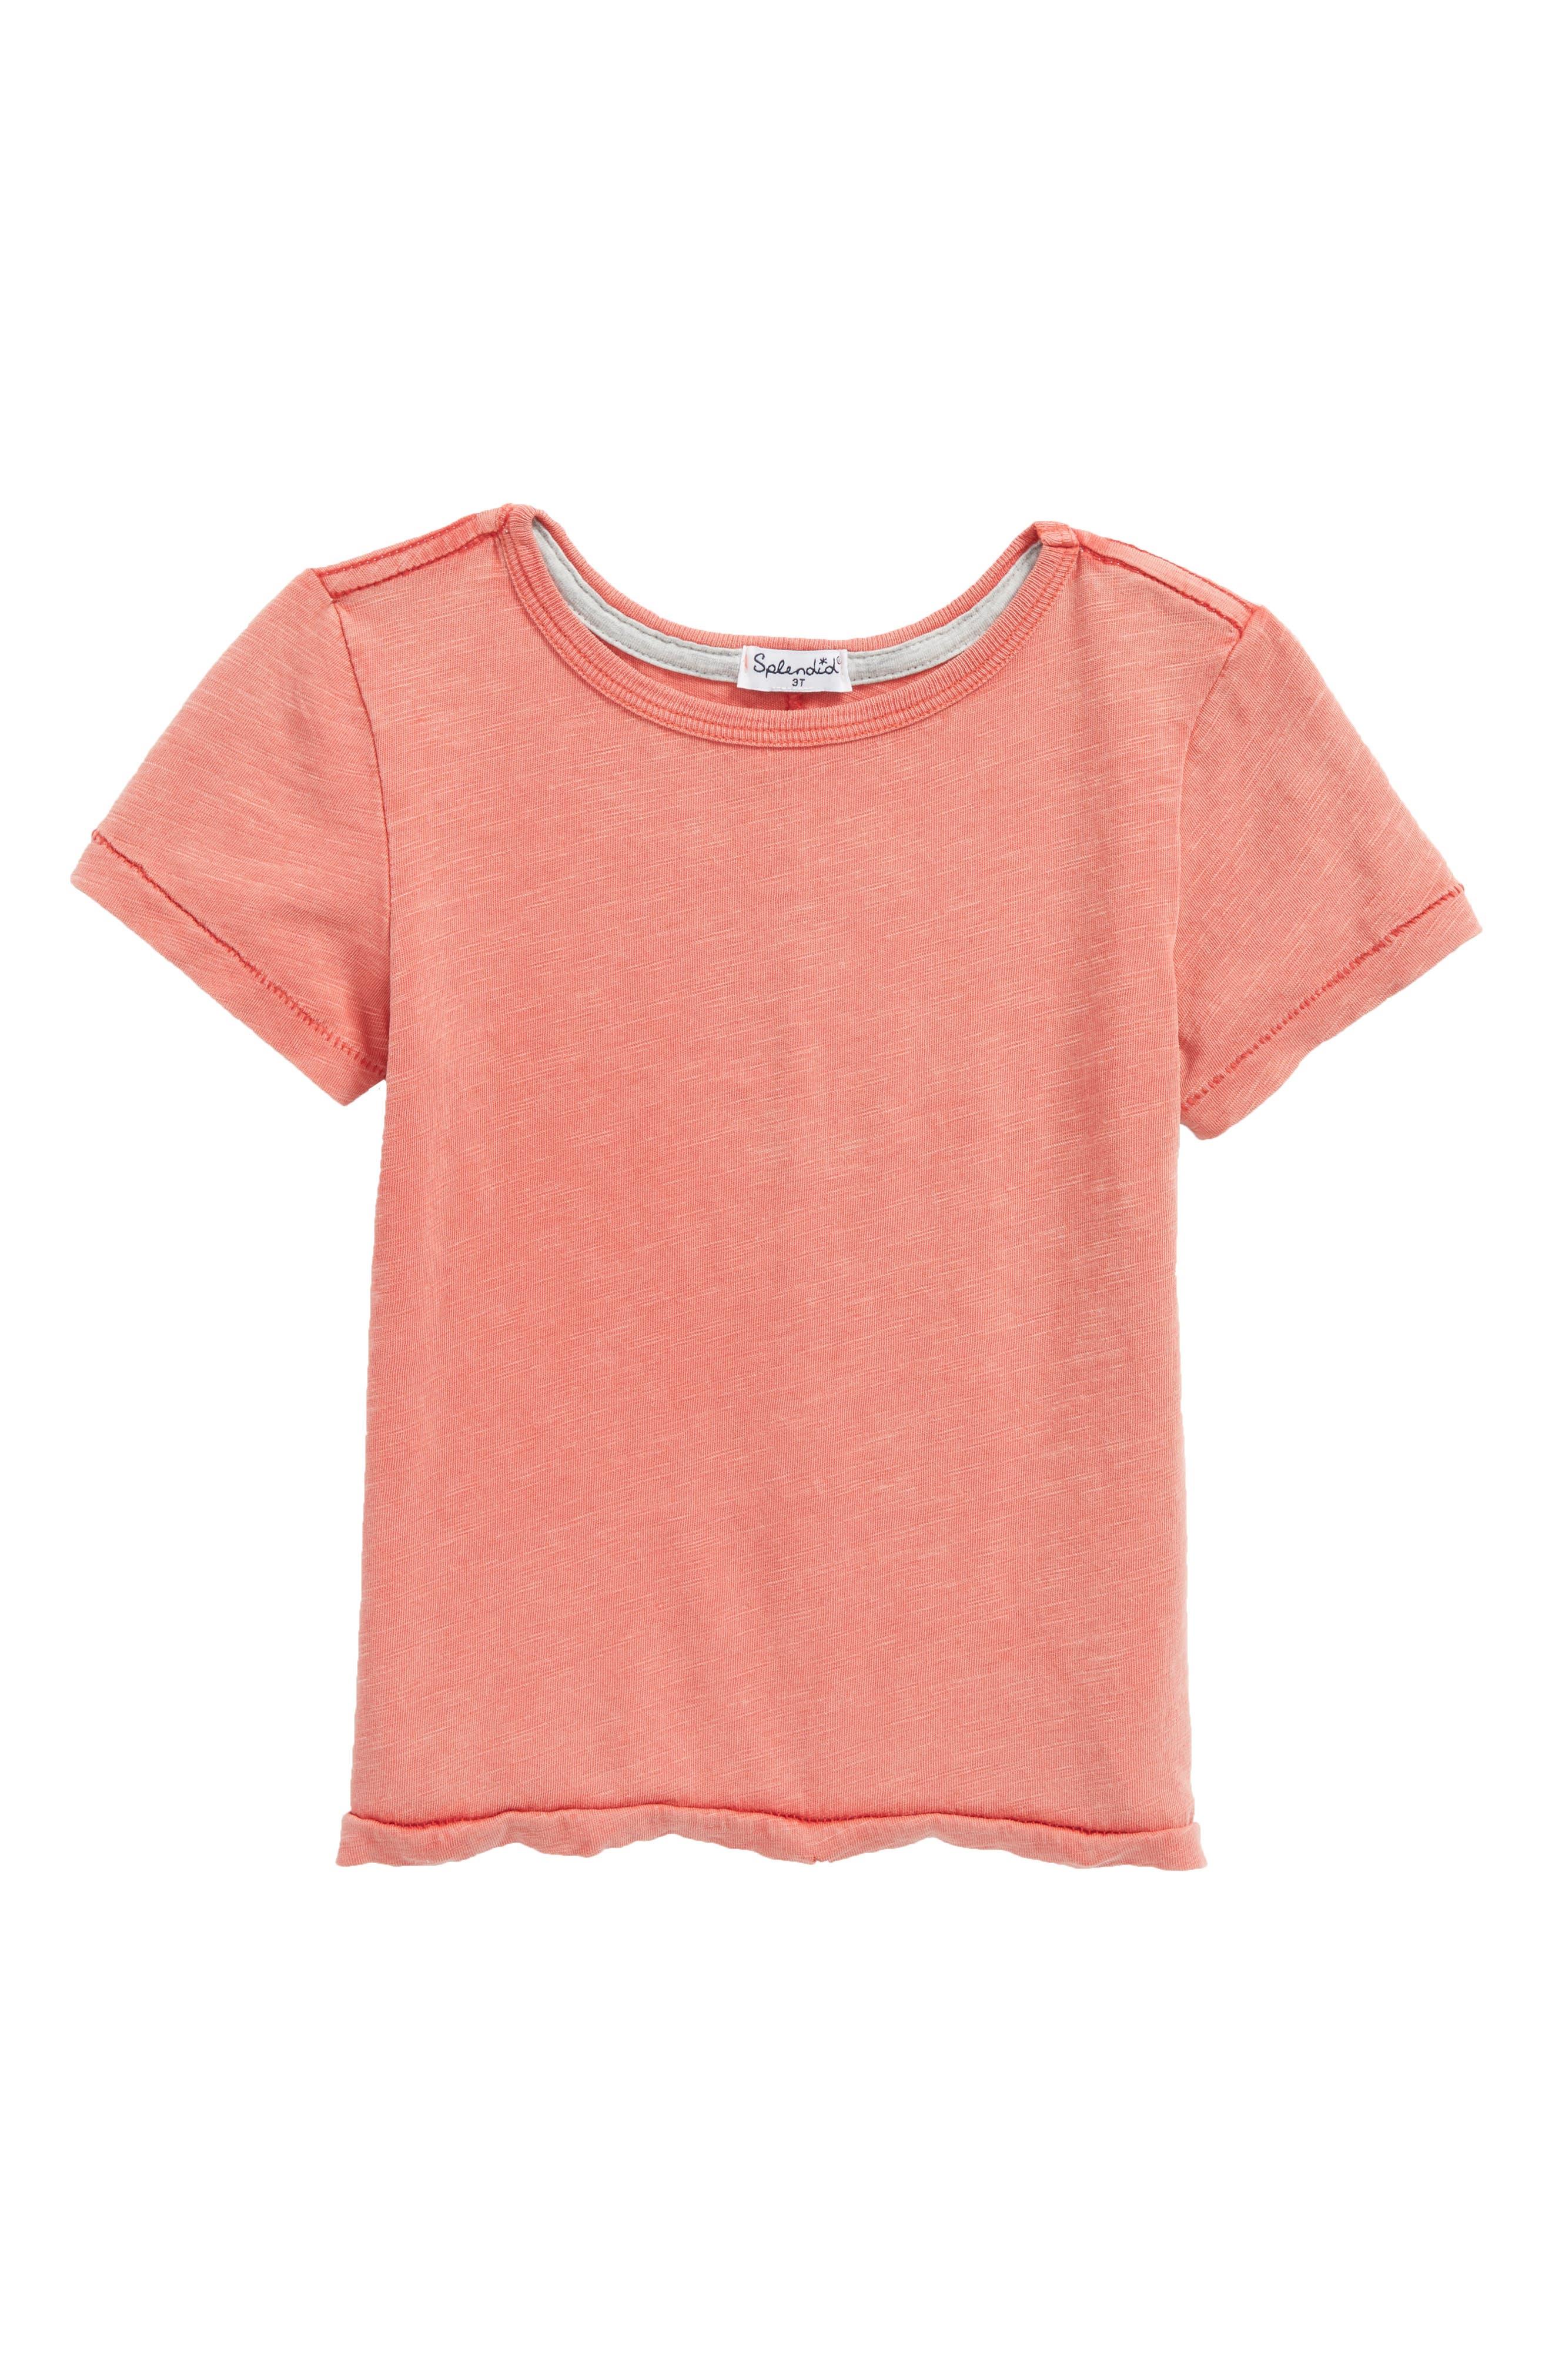 Main Image - Splendid Washed Slub Jersey T-Shirt (Toddler Boys & Little Boys)